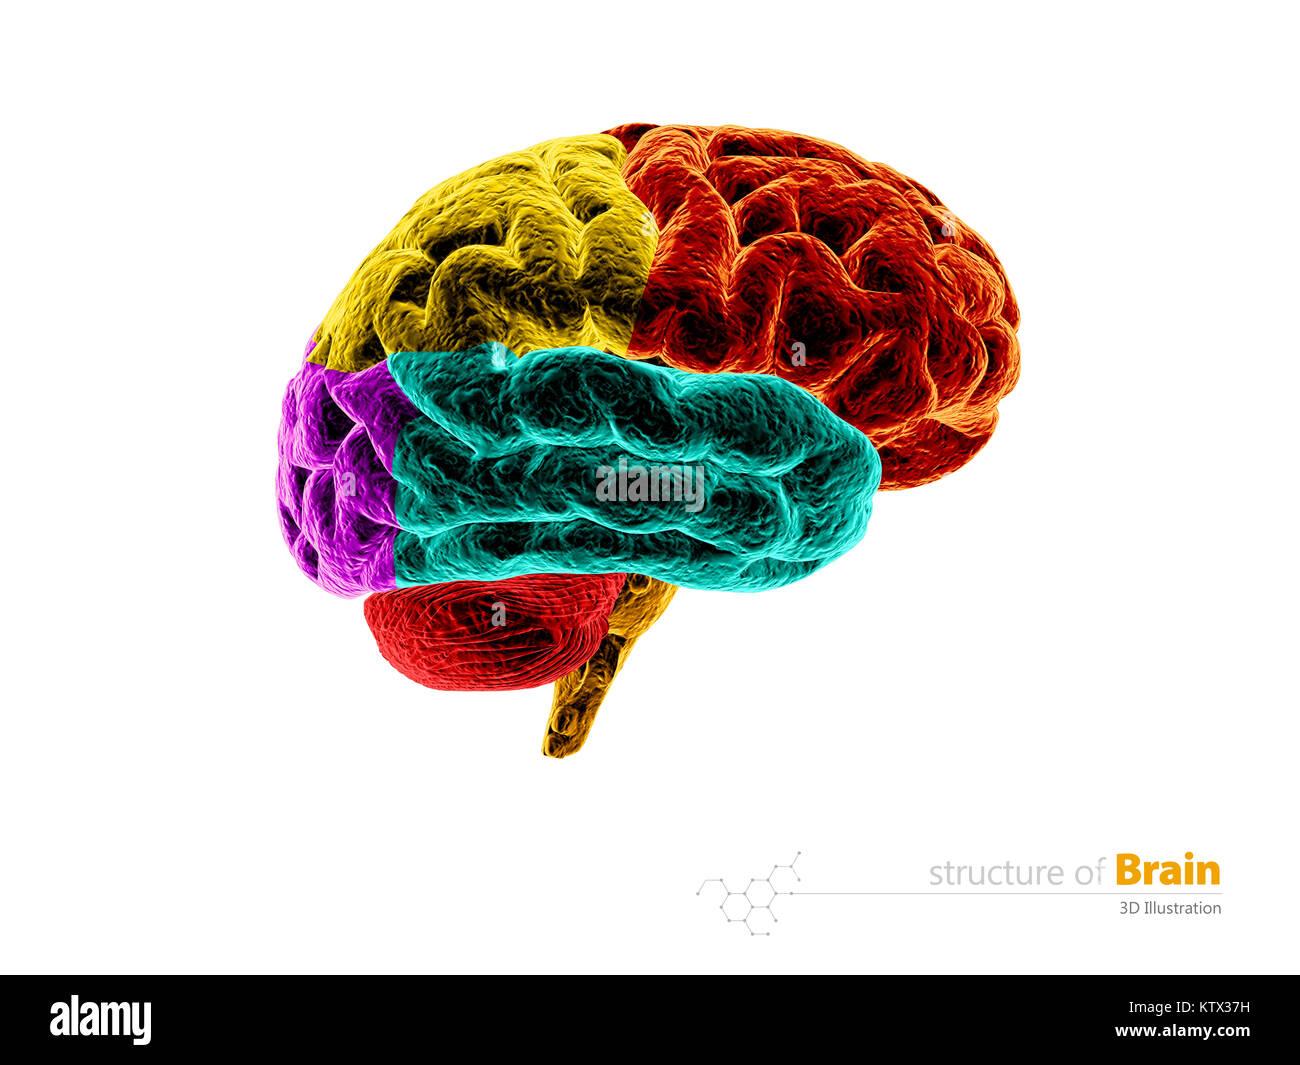 Human Brain Anatomy Structure Human Brain Anatomy 3d Illustration